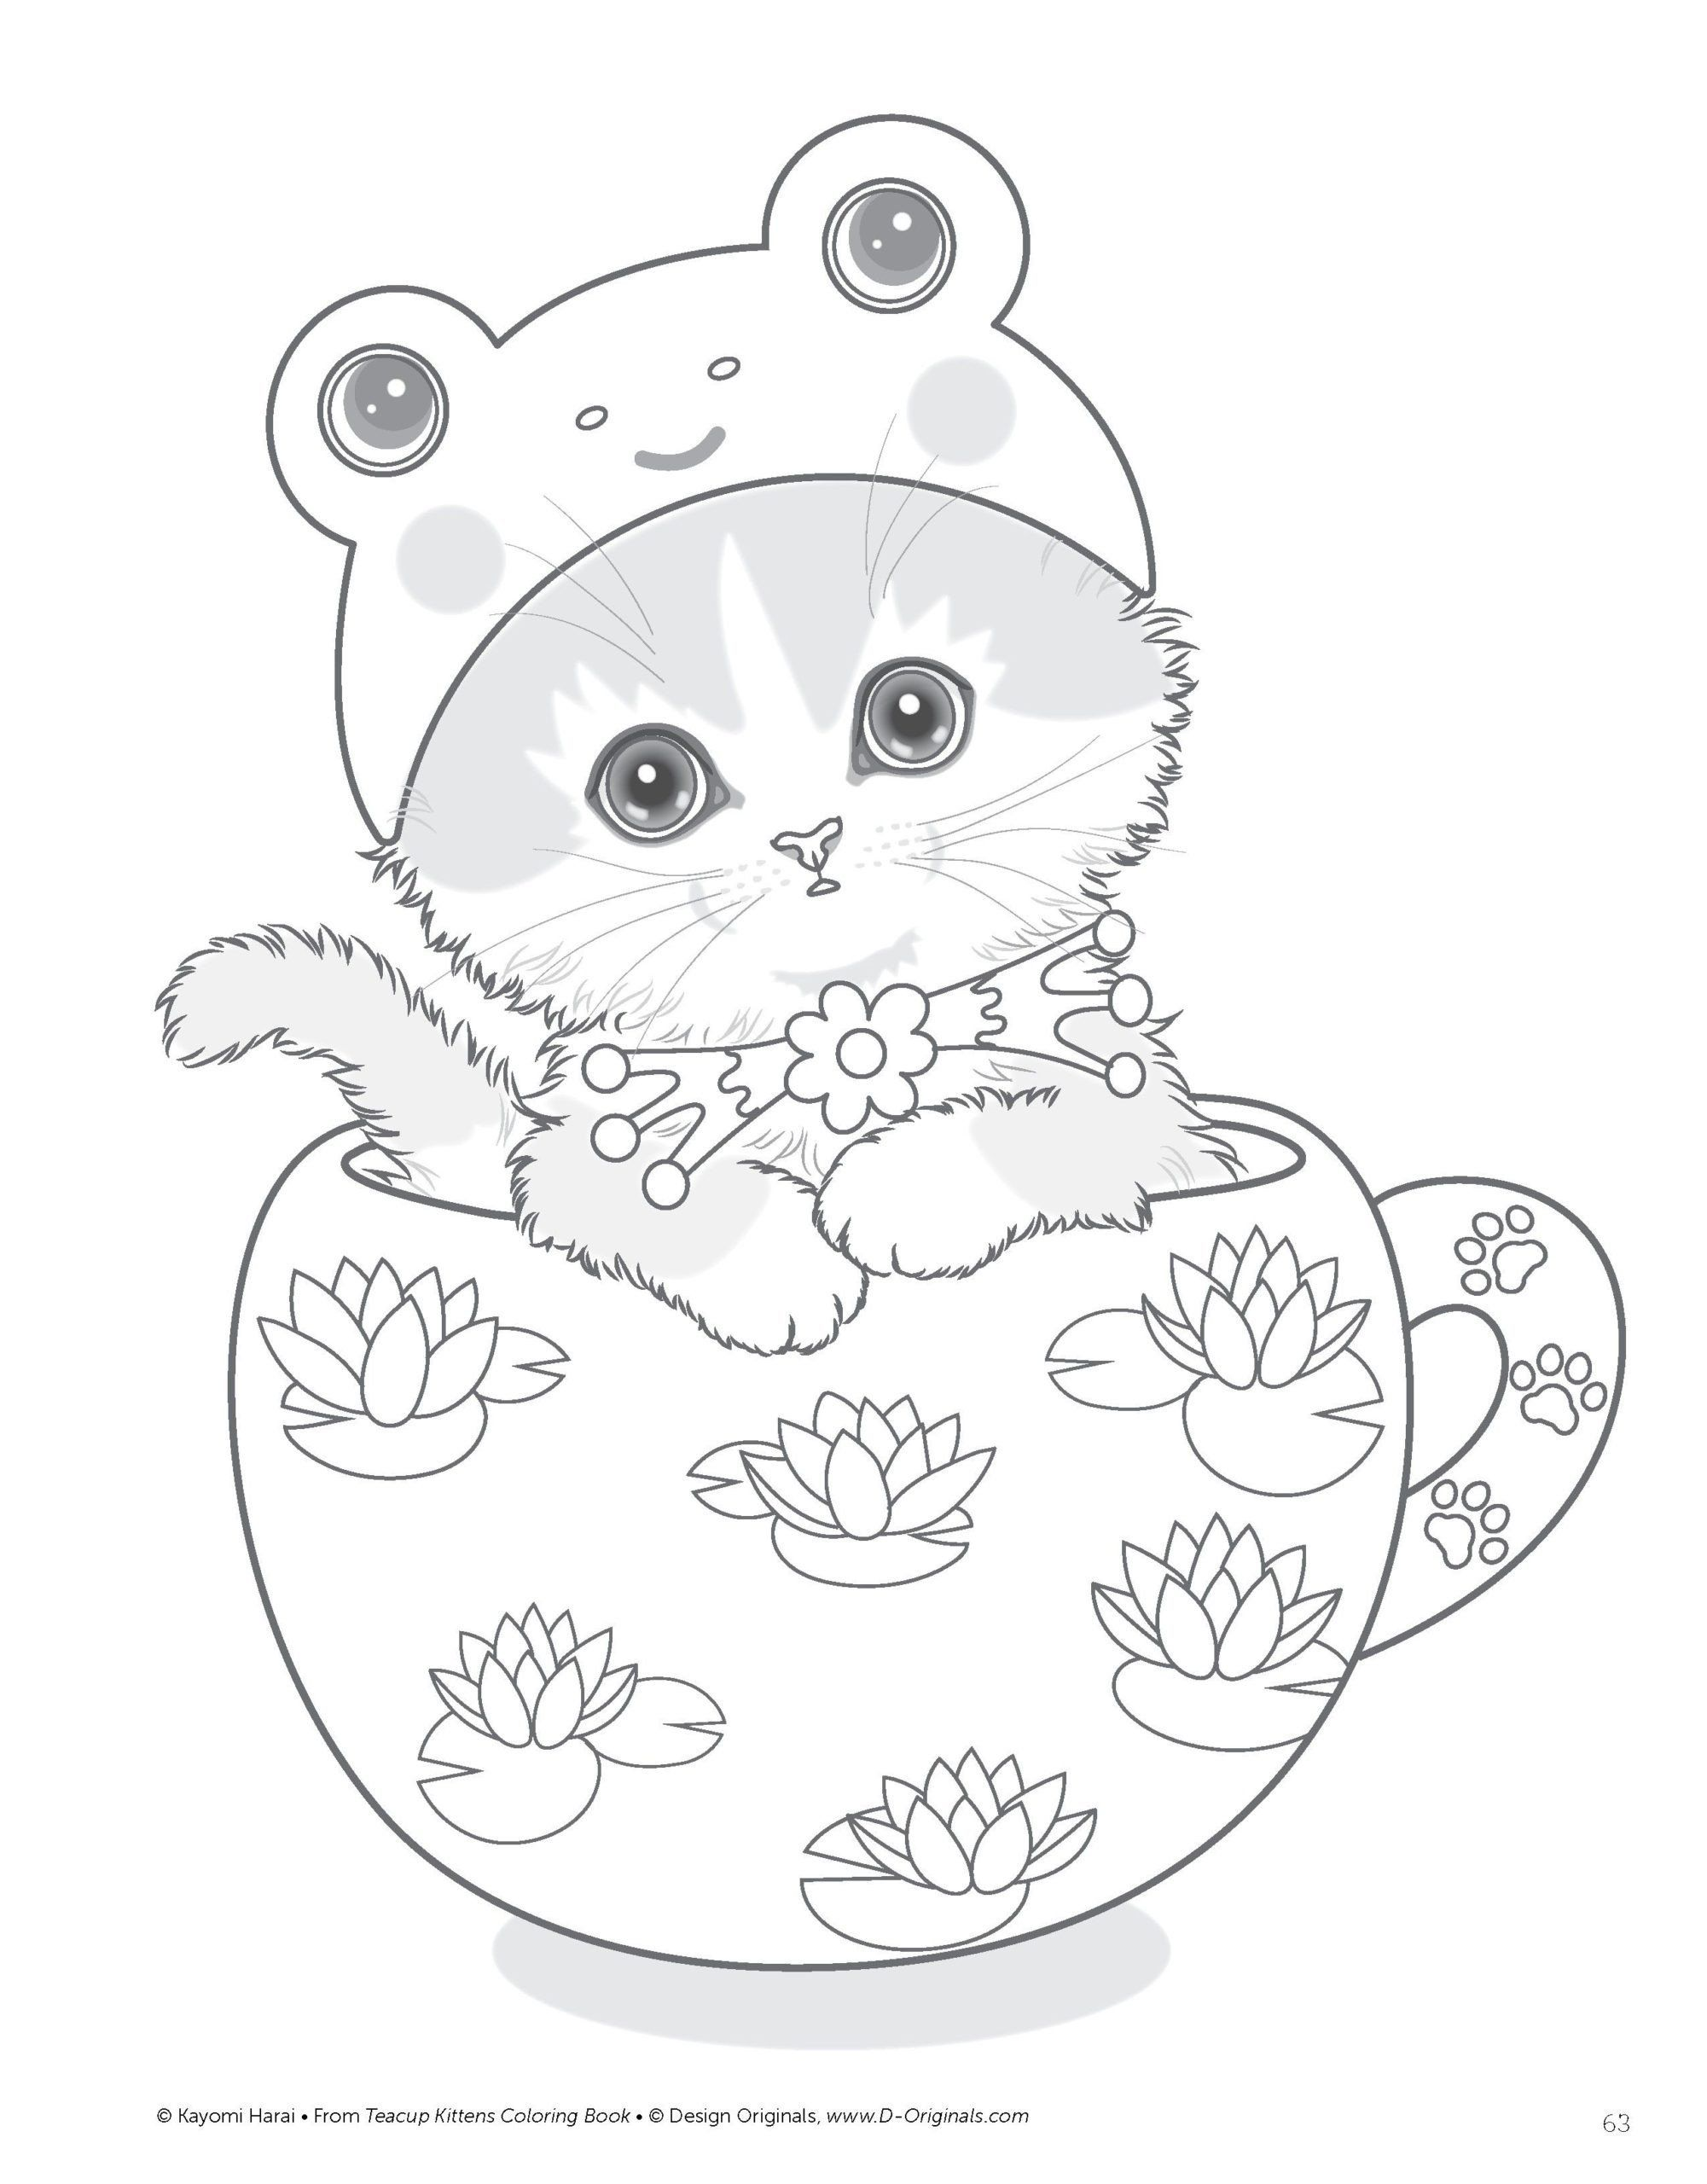 Cat Coloring Pages Free Coloring Pages Coloring Book Printable Cat And Kitten Free In 2020 Kitten Coloring Book Cat Coloring Book Kittens Coloring